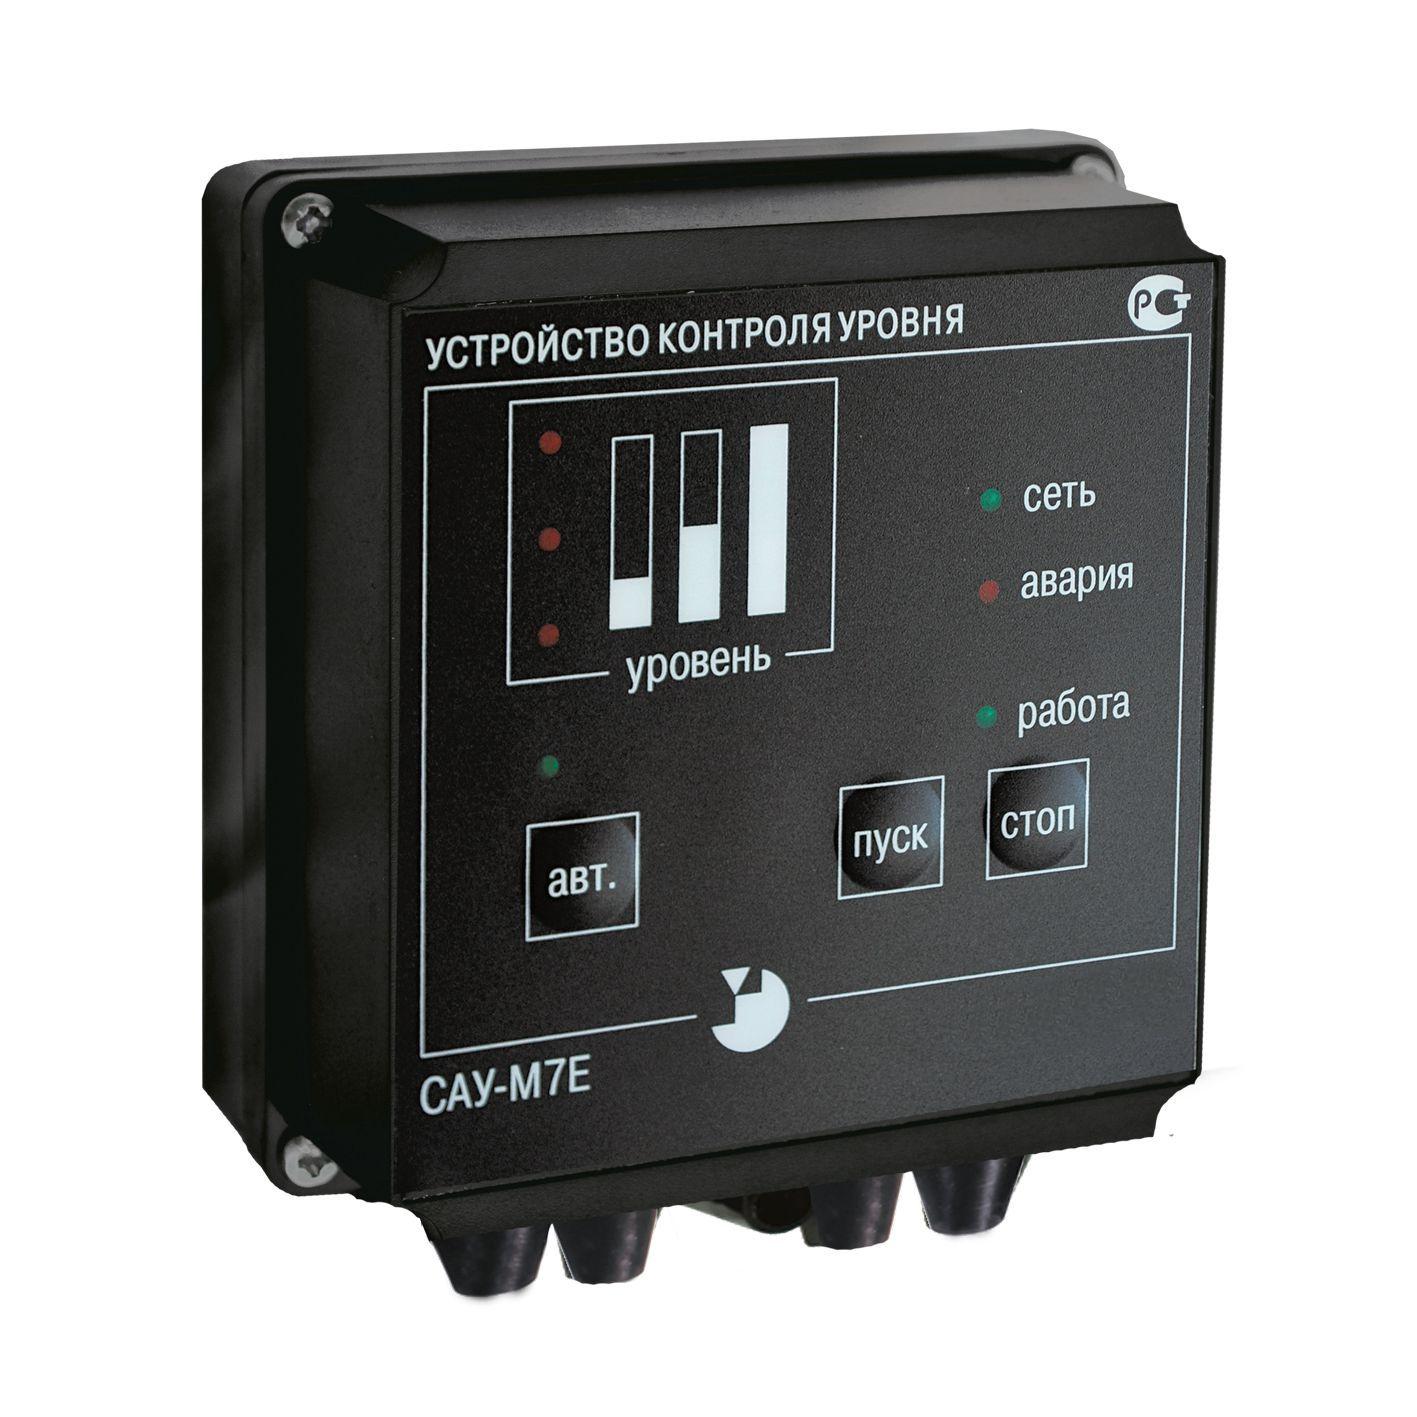 САУ-М7Е сигнализатор-регулятор уровня жидких сред